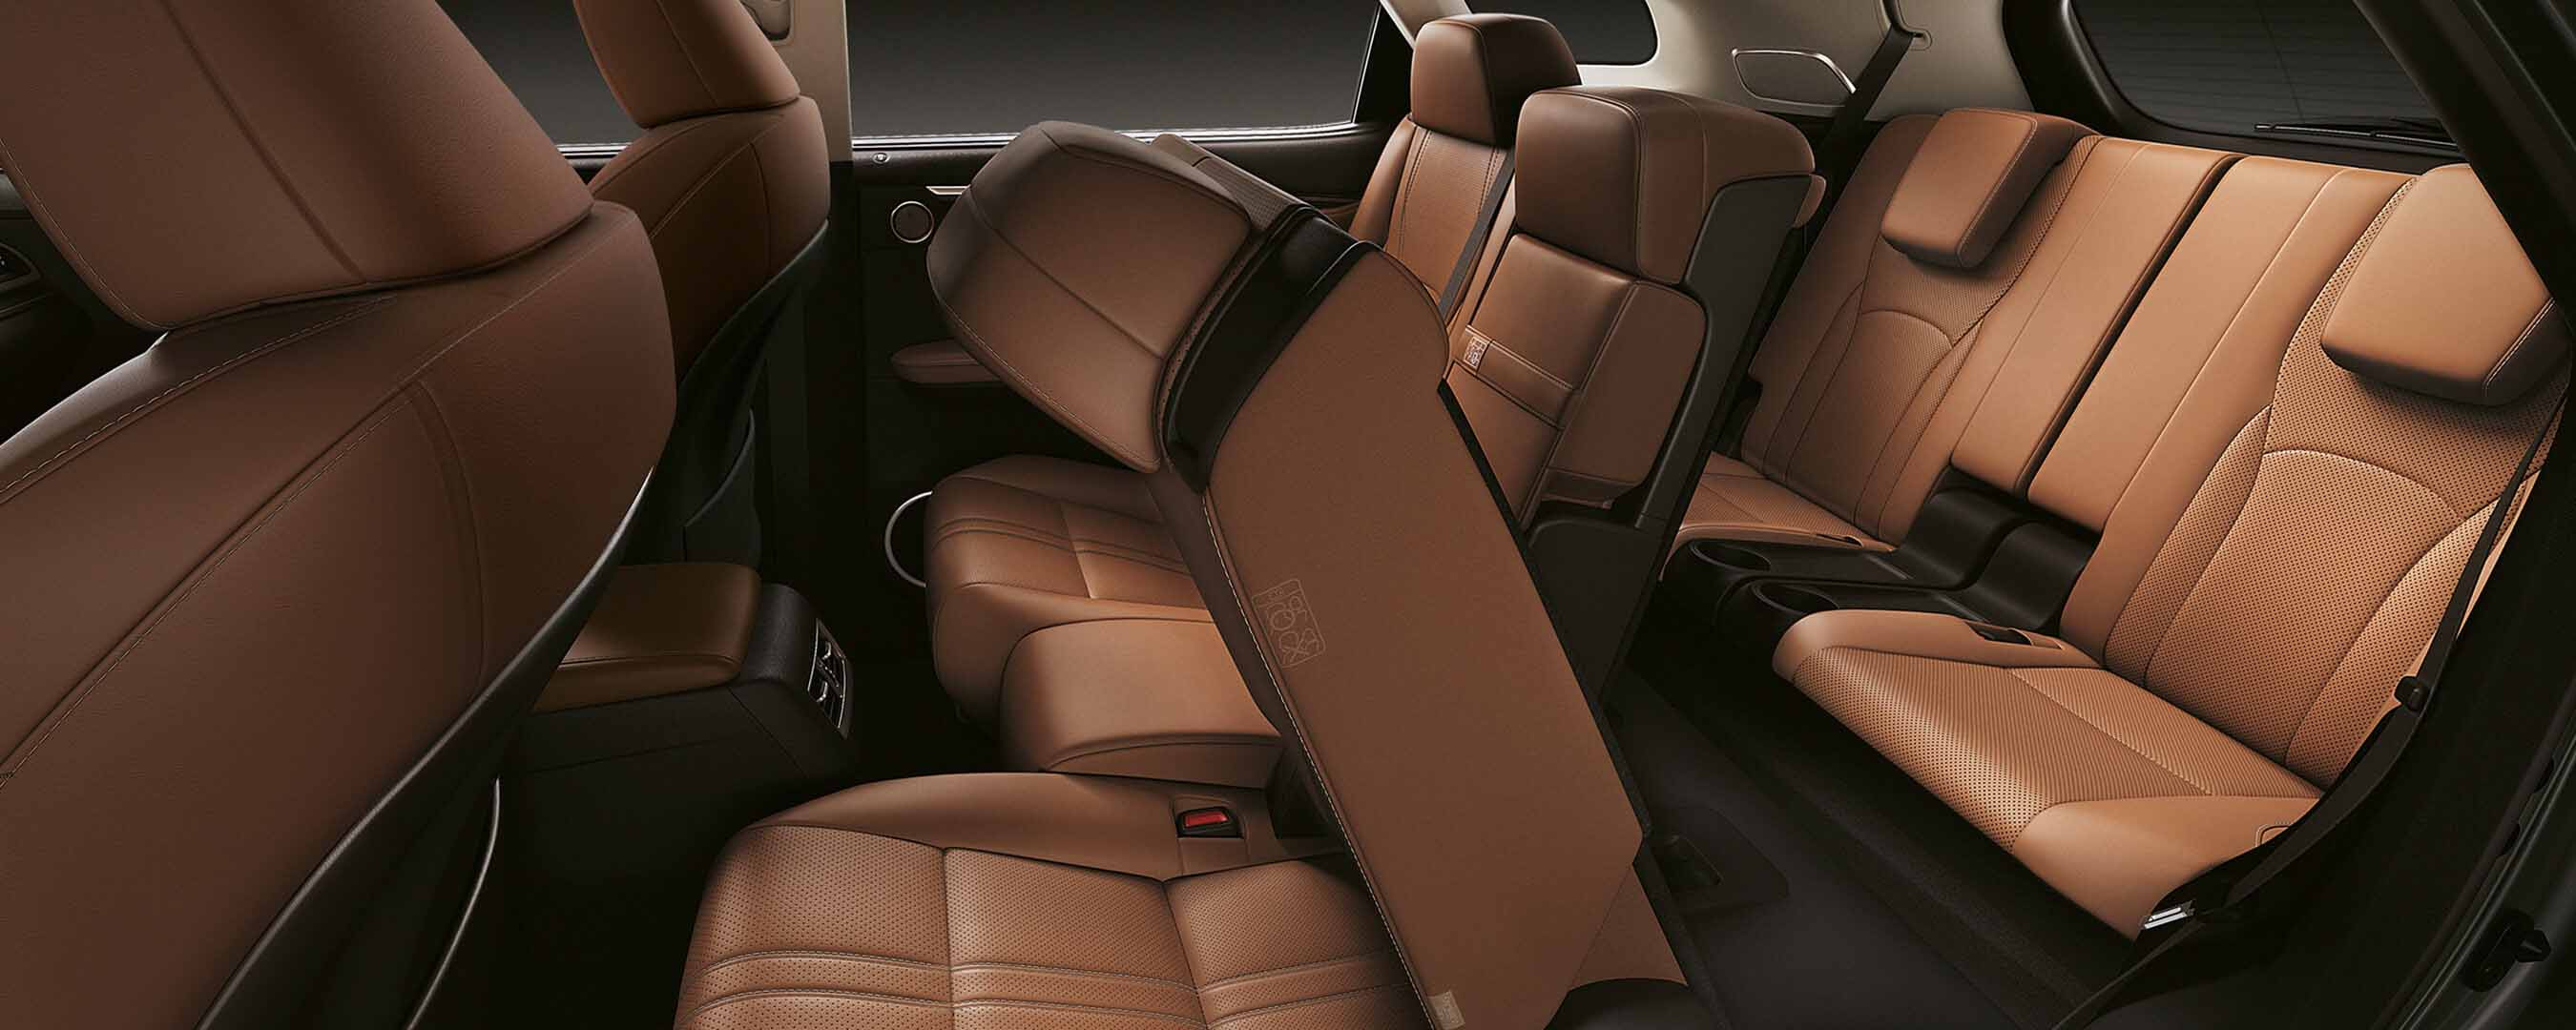 2018 lexus rx l experience interior back